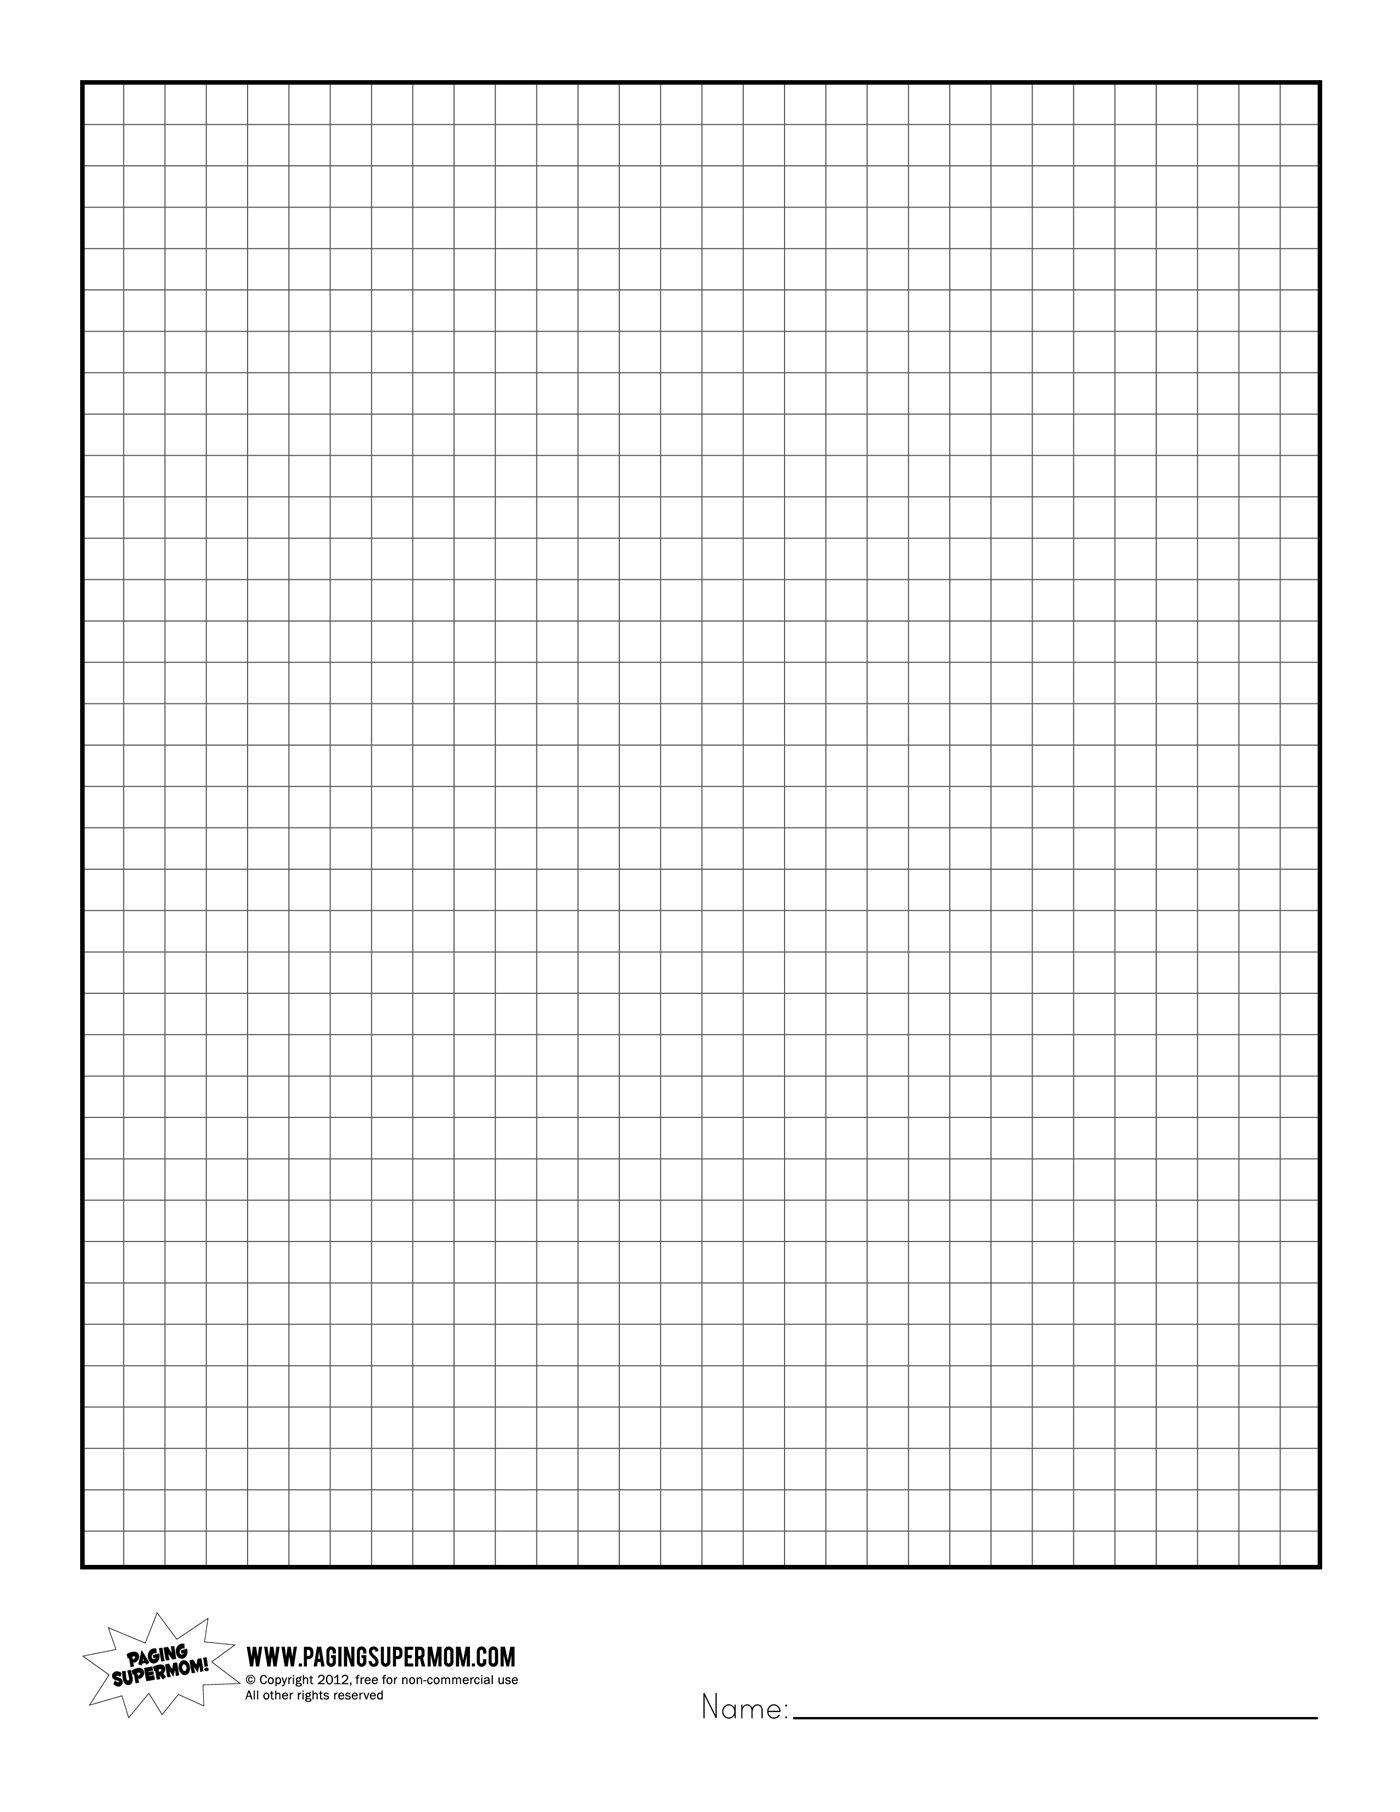 Printable Graph Paper | Healthy Eating | Printable Graph Paper - Free Printable Graph Paper 1 4 Inch